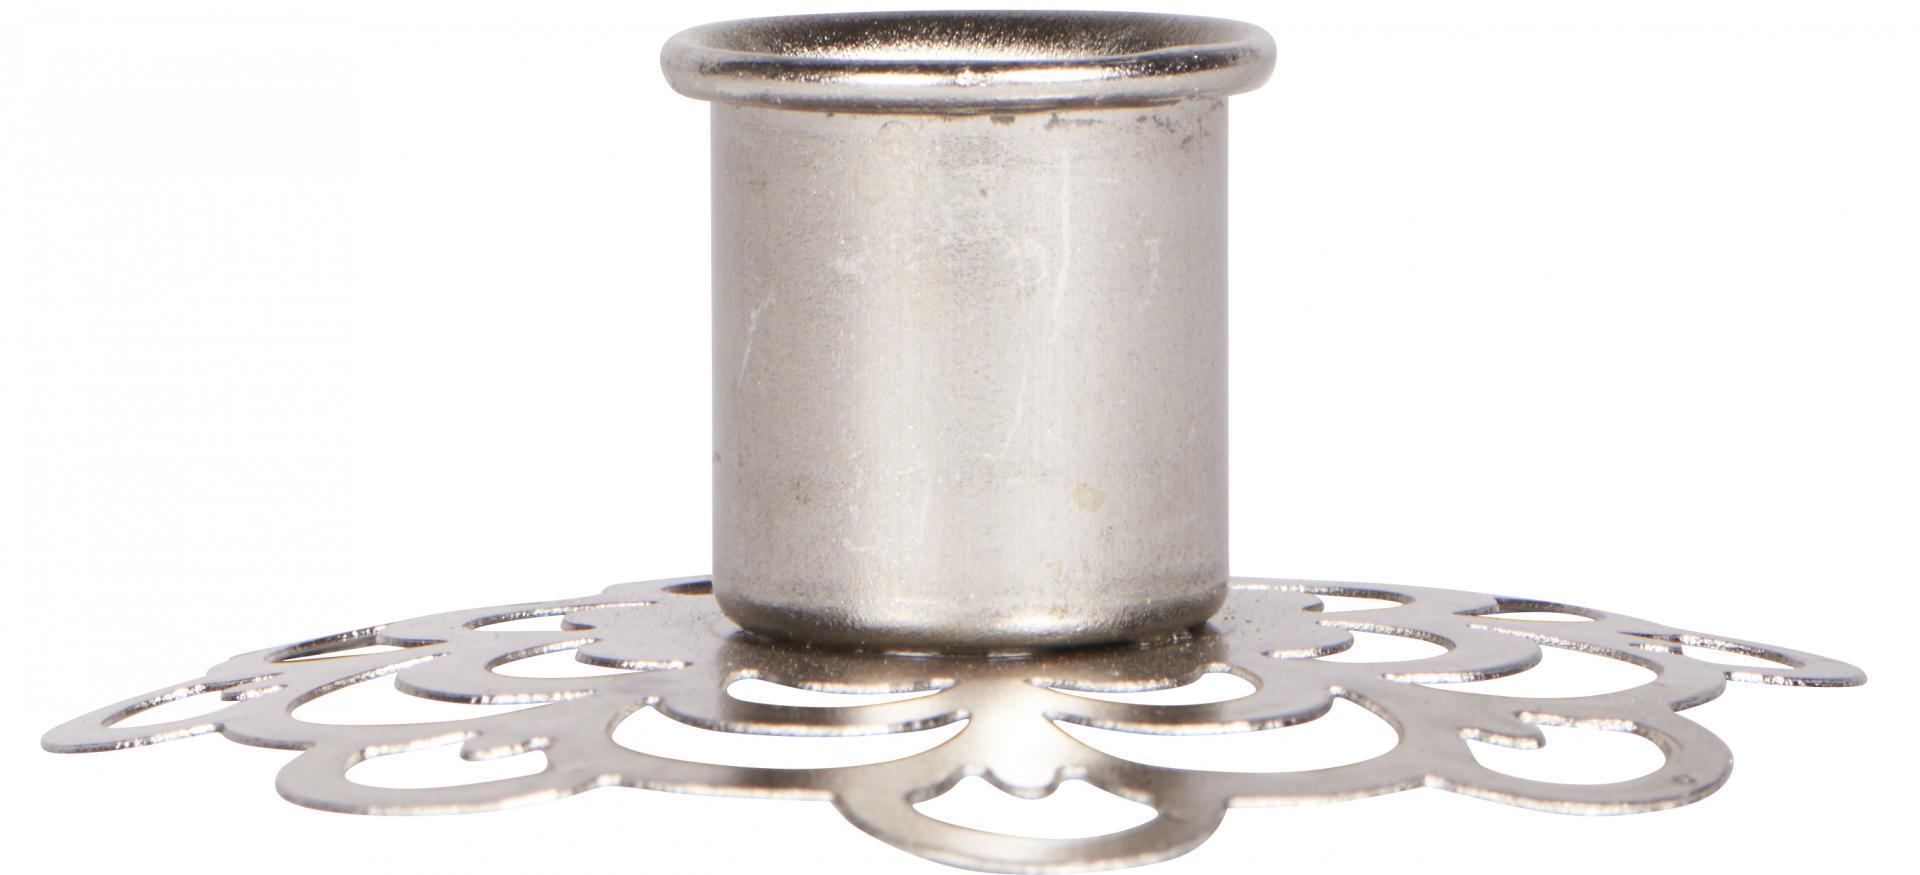 IB LAURSEN Kovový svícen Flower Pattern Silver, stříbrná barva, kov